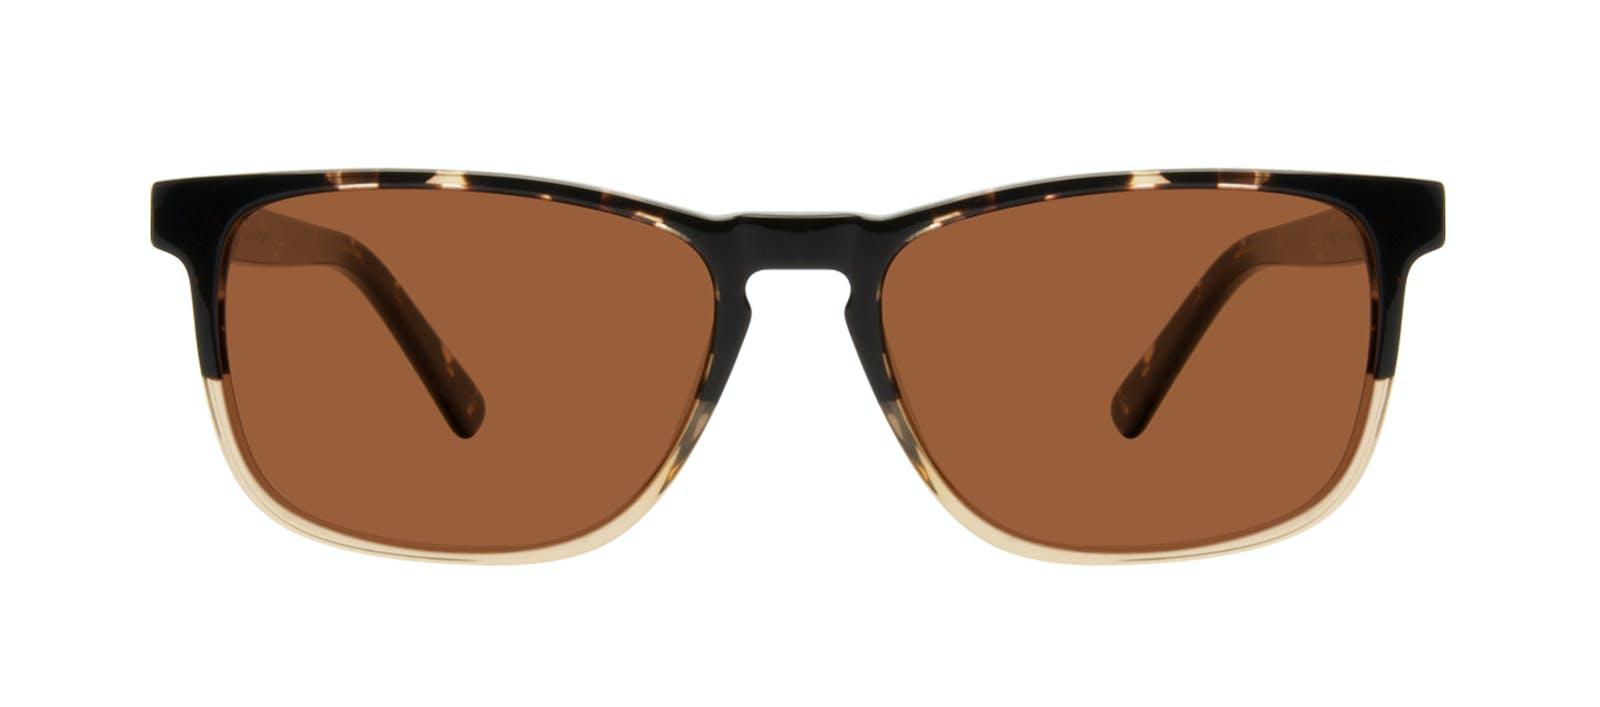 4c6f1c009c Affordable Fashion Glasses Rectangle Sunglasses Men Loft Golden Tortoise  Front